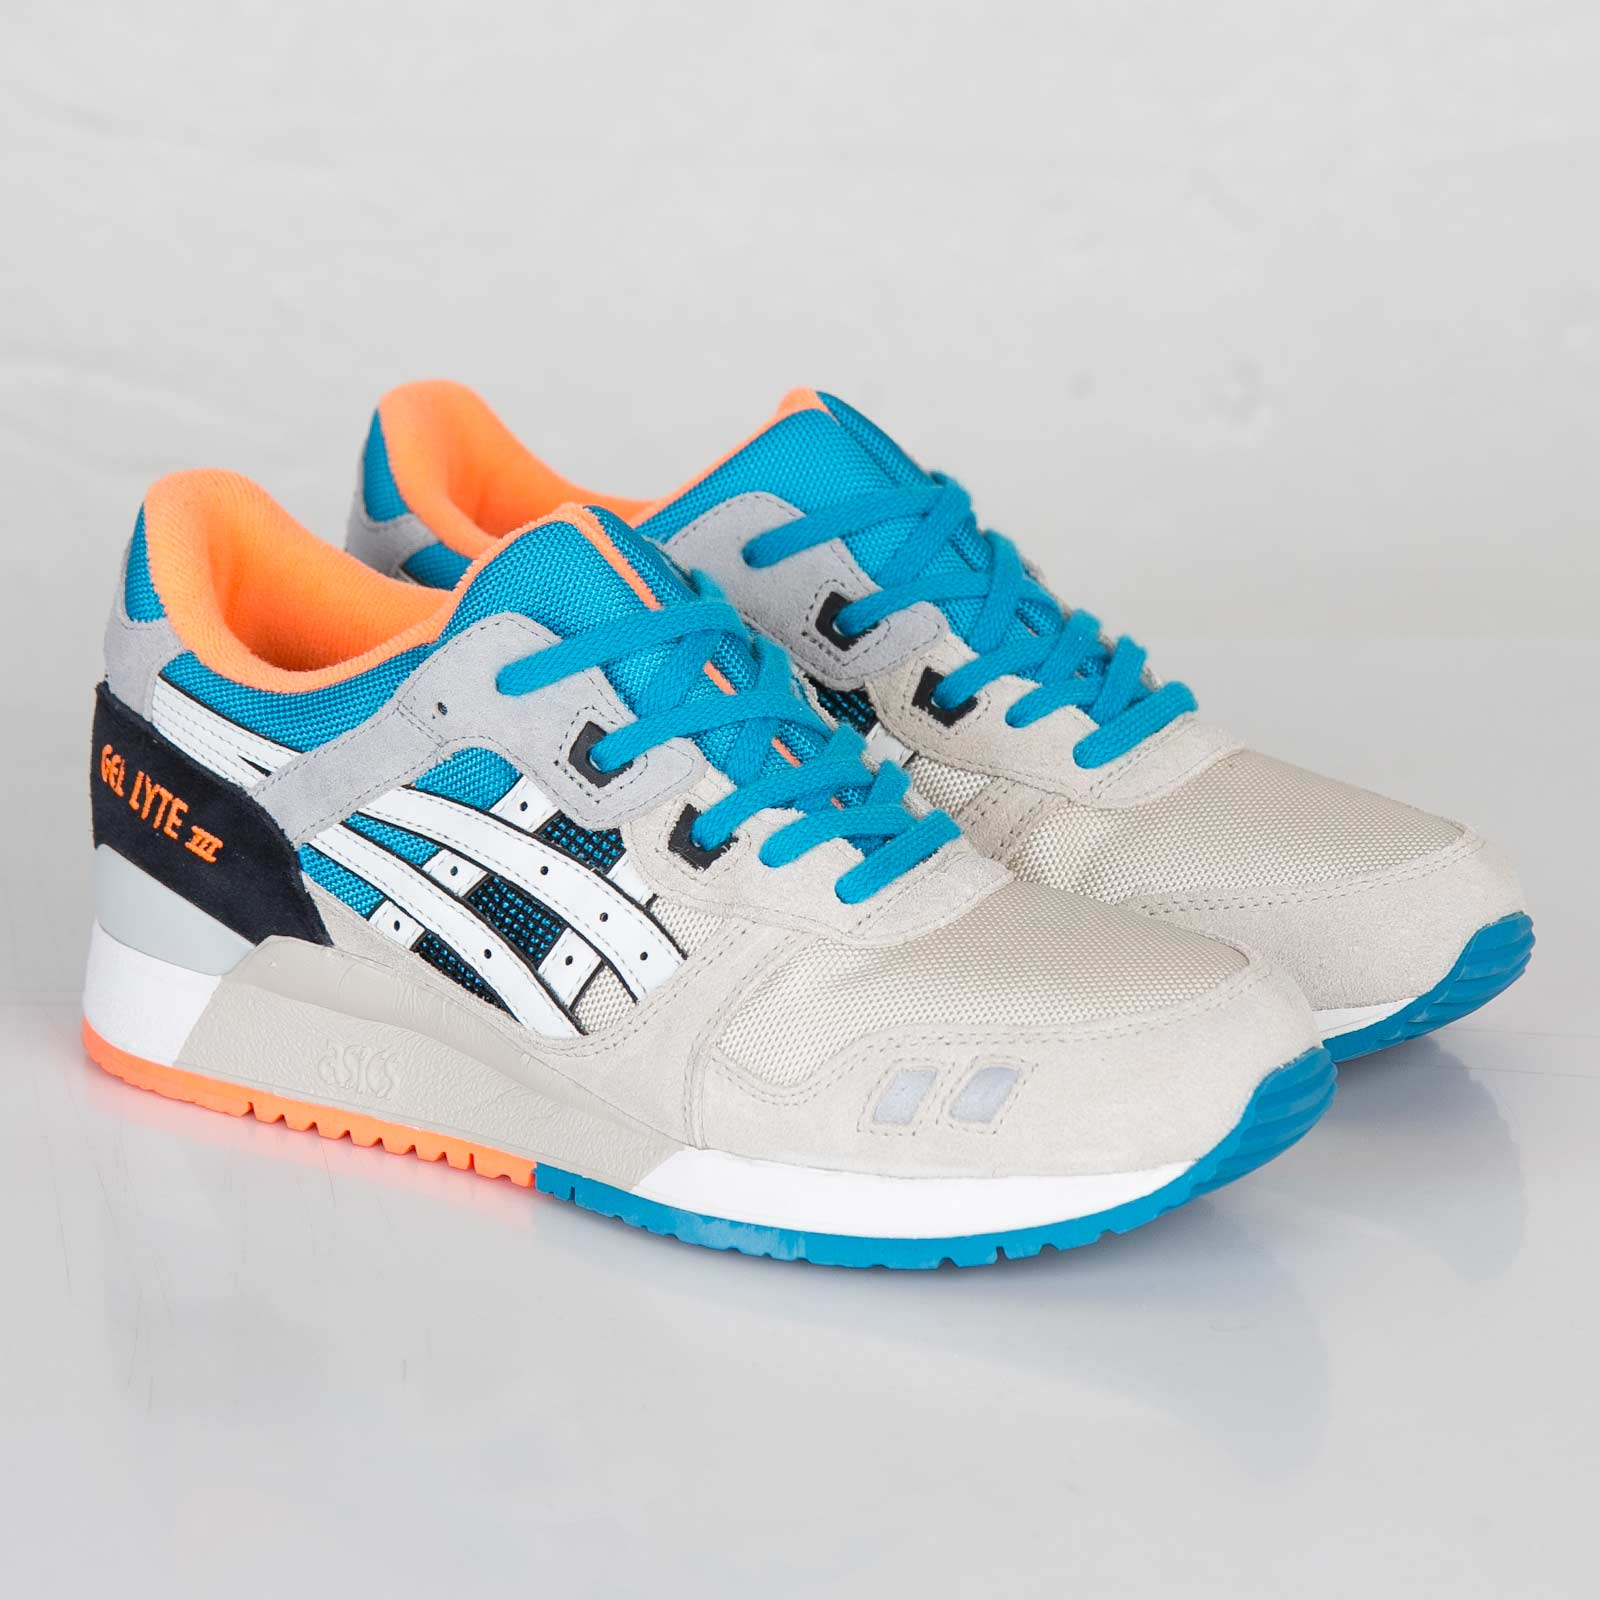 brand new c209b d2954 ASICS Tiger Gel-Lyte III - H405n-9901 - Sneakersnstuff ...